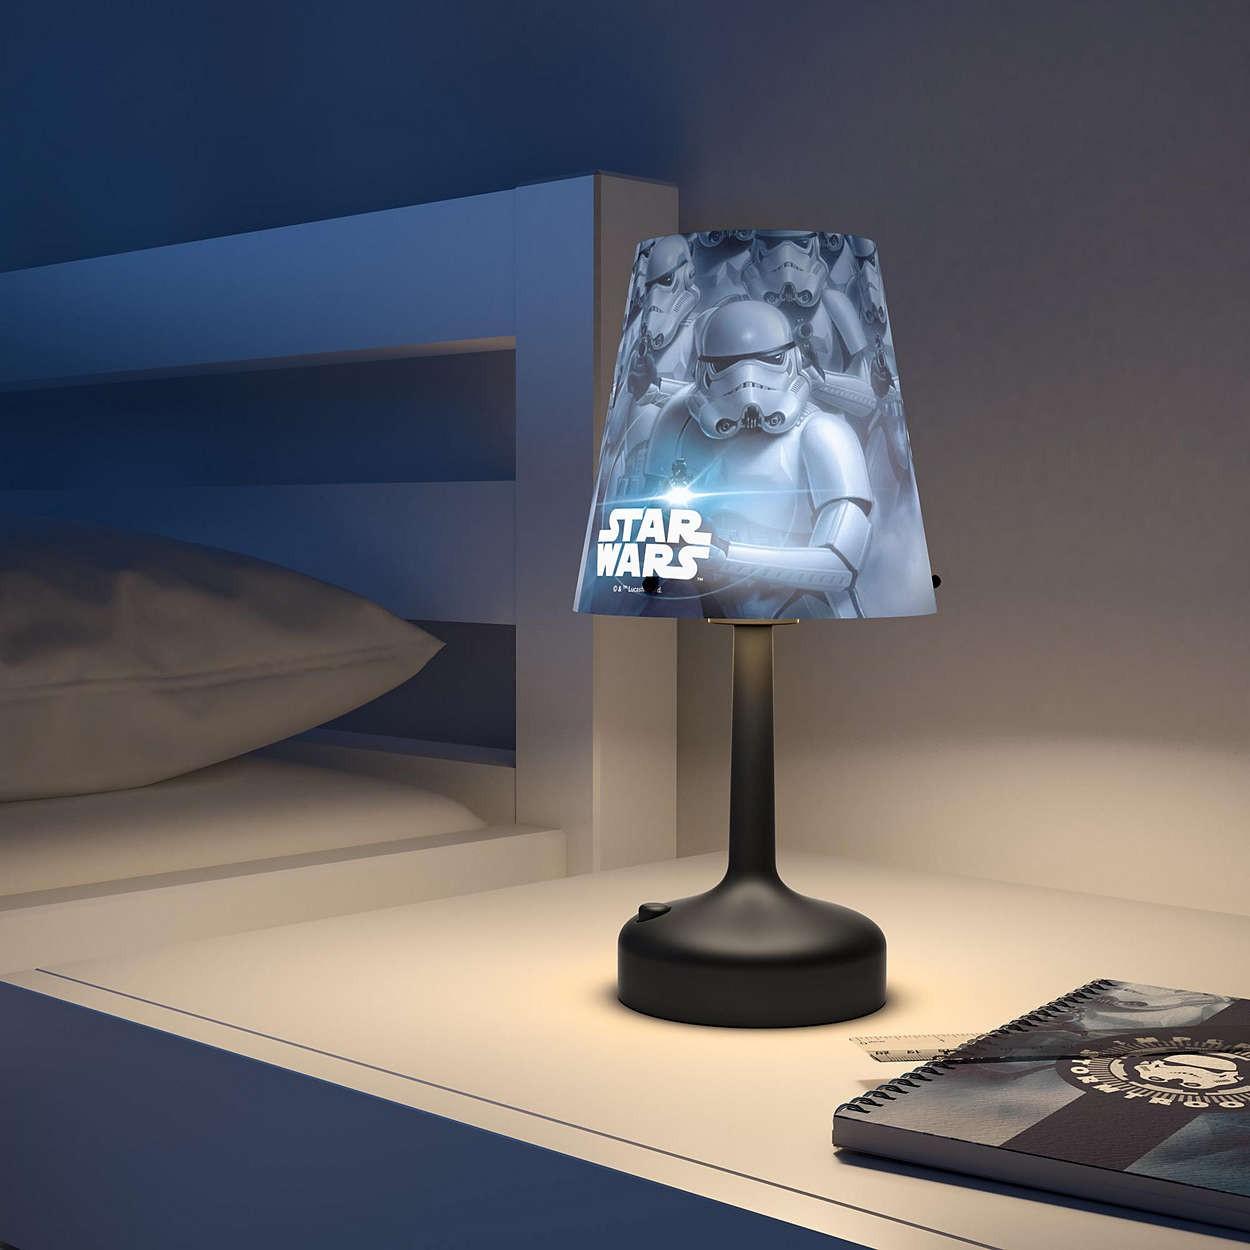 lampe à piles led star wars stormtroopers - philips | comptoir des